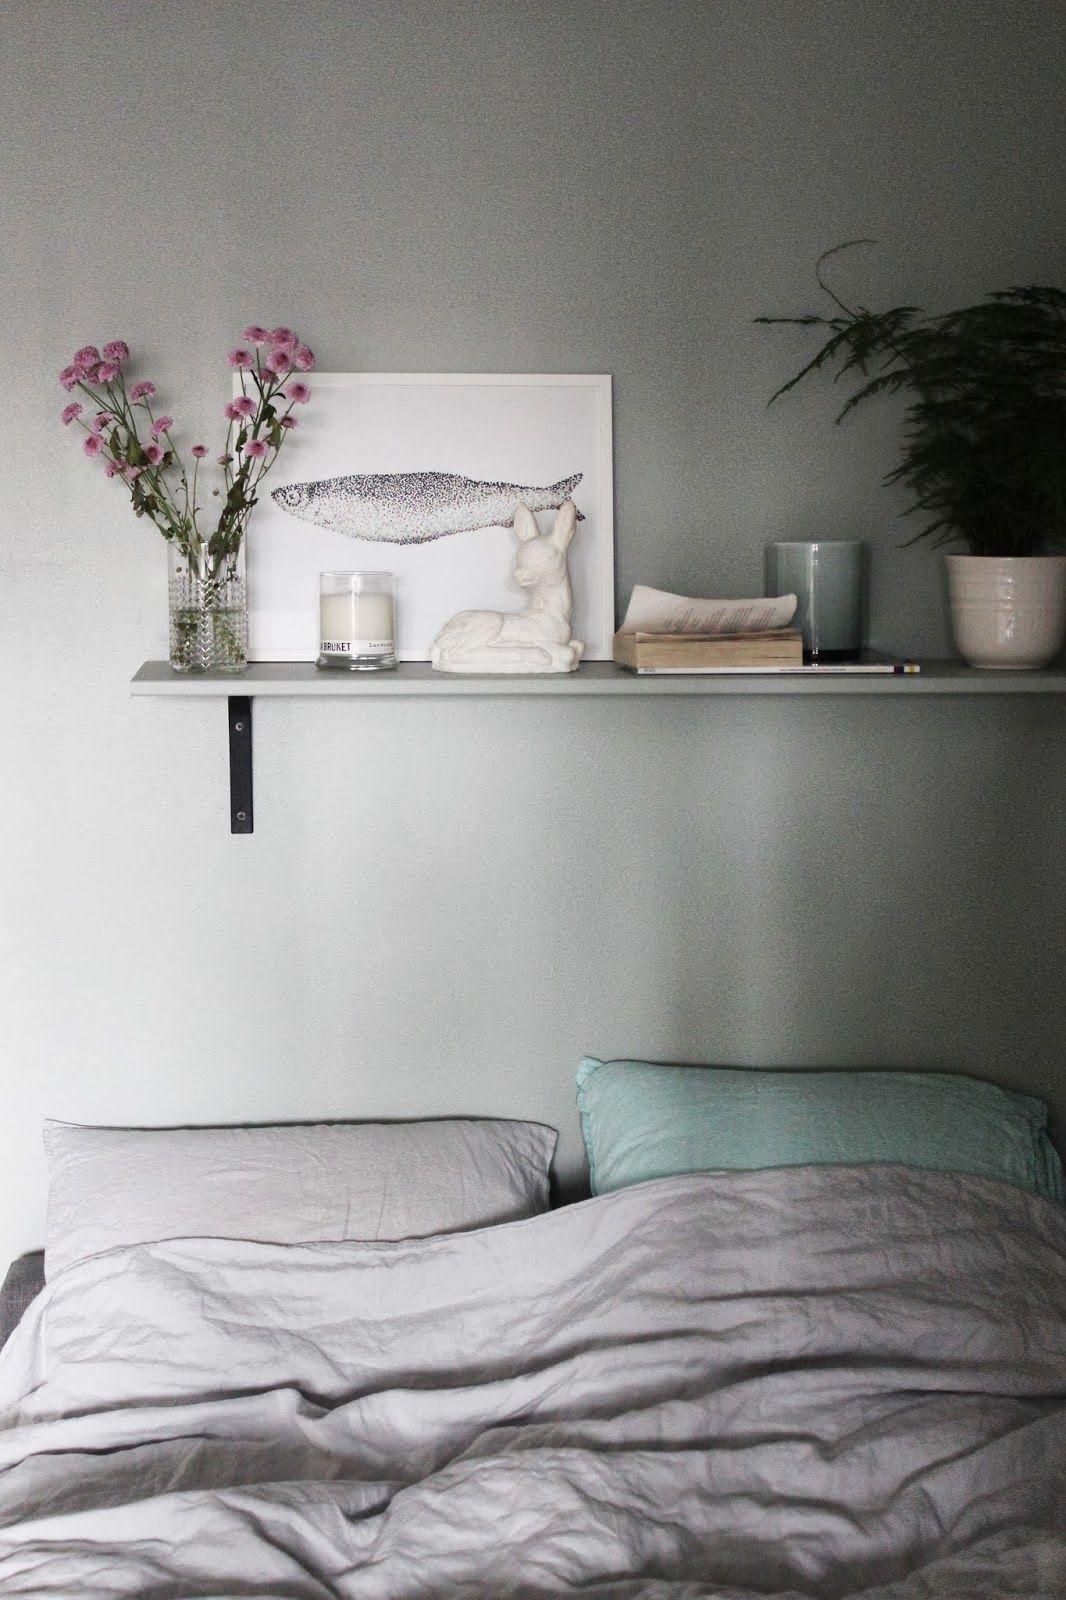 hylde over seng Hylde over seng | Interior | Pinterest | Seng, Hjem and Hylde hylde over seng